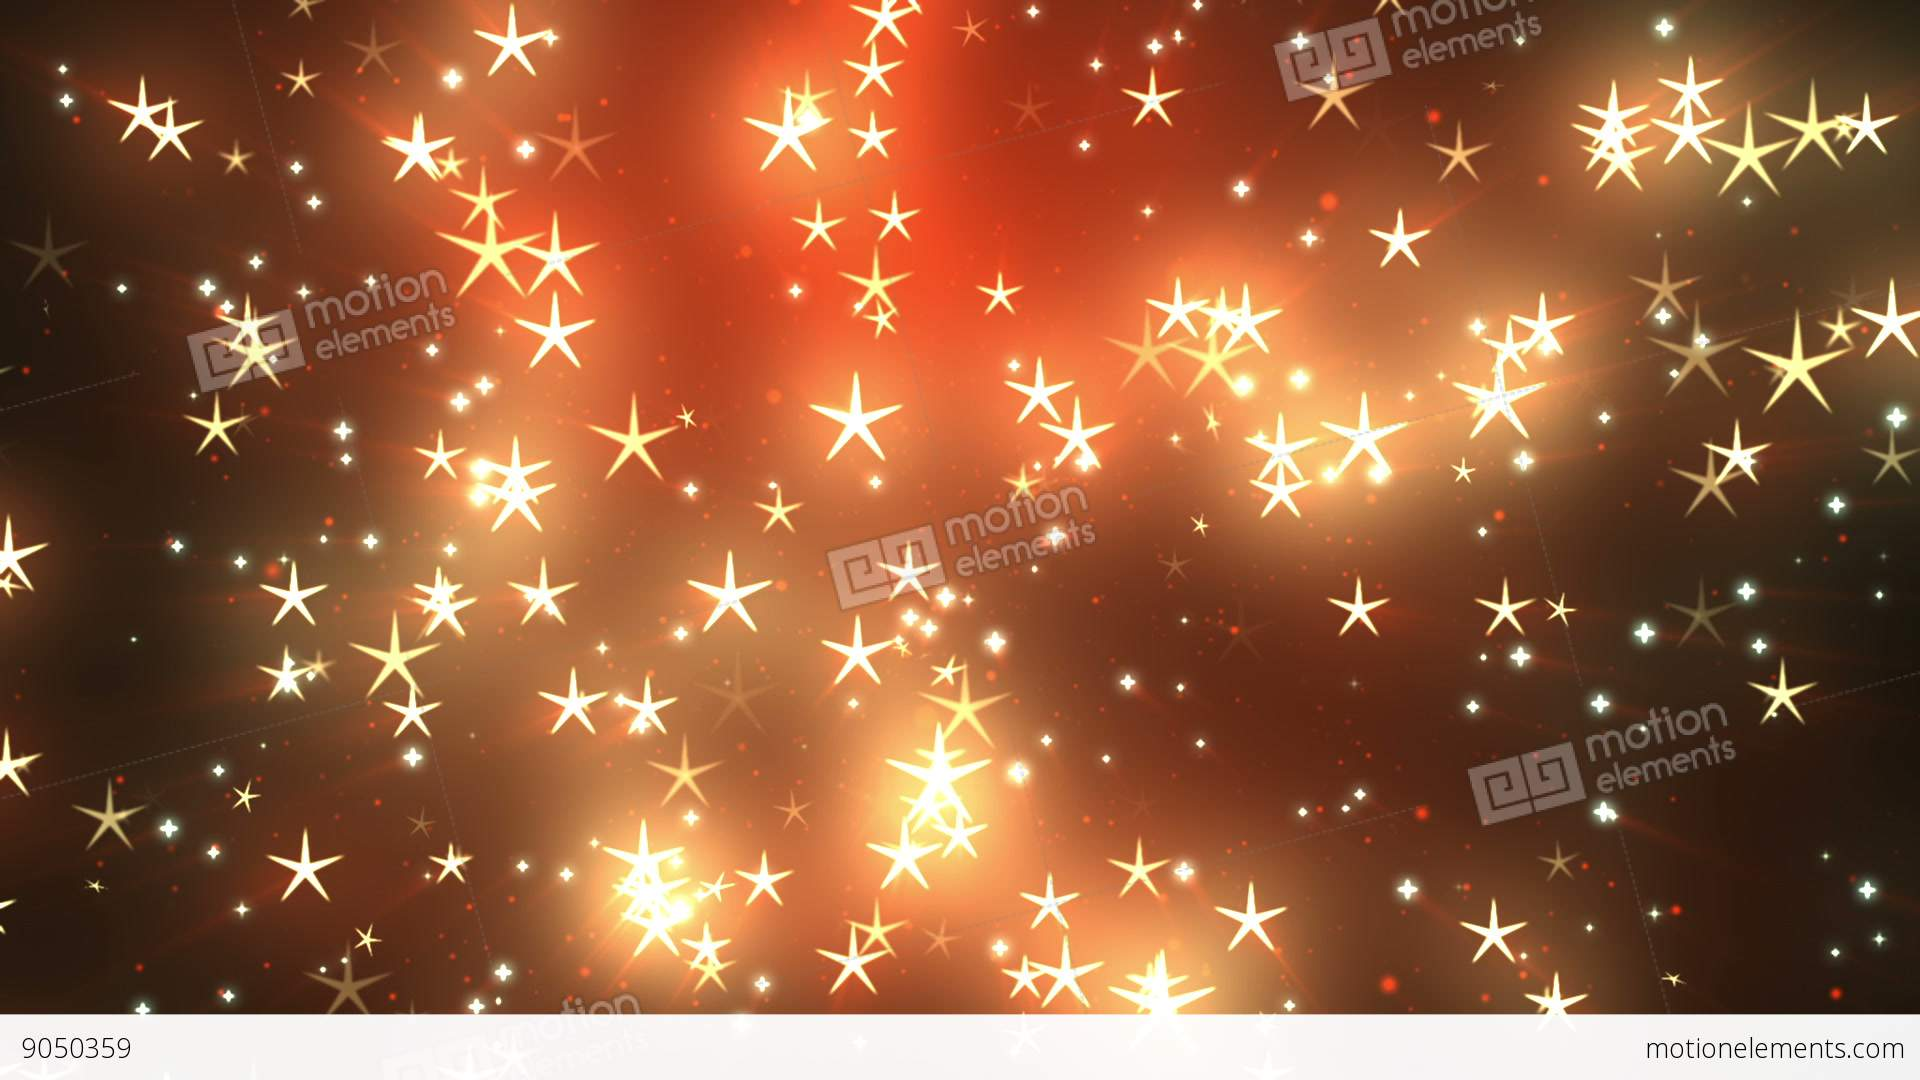 Celebration Background Hd: Celebration Stars 4 Loopable Background Stock Animation